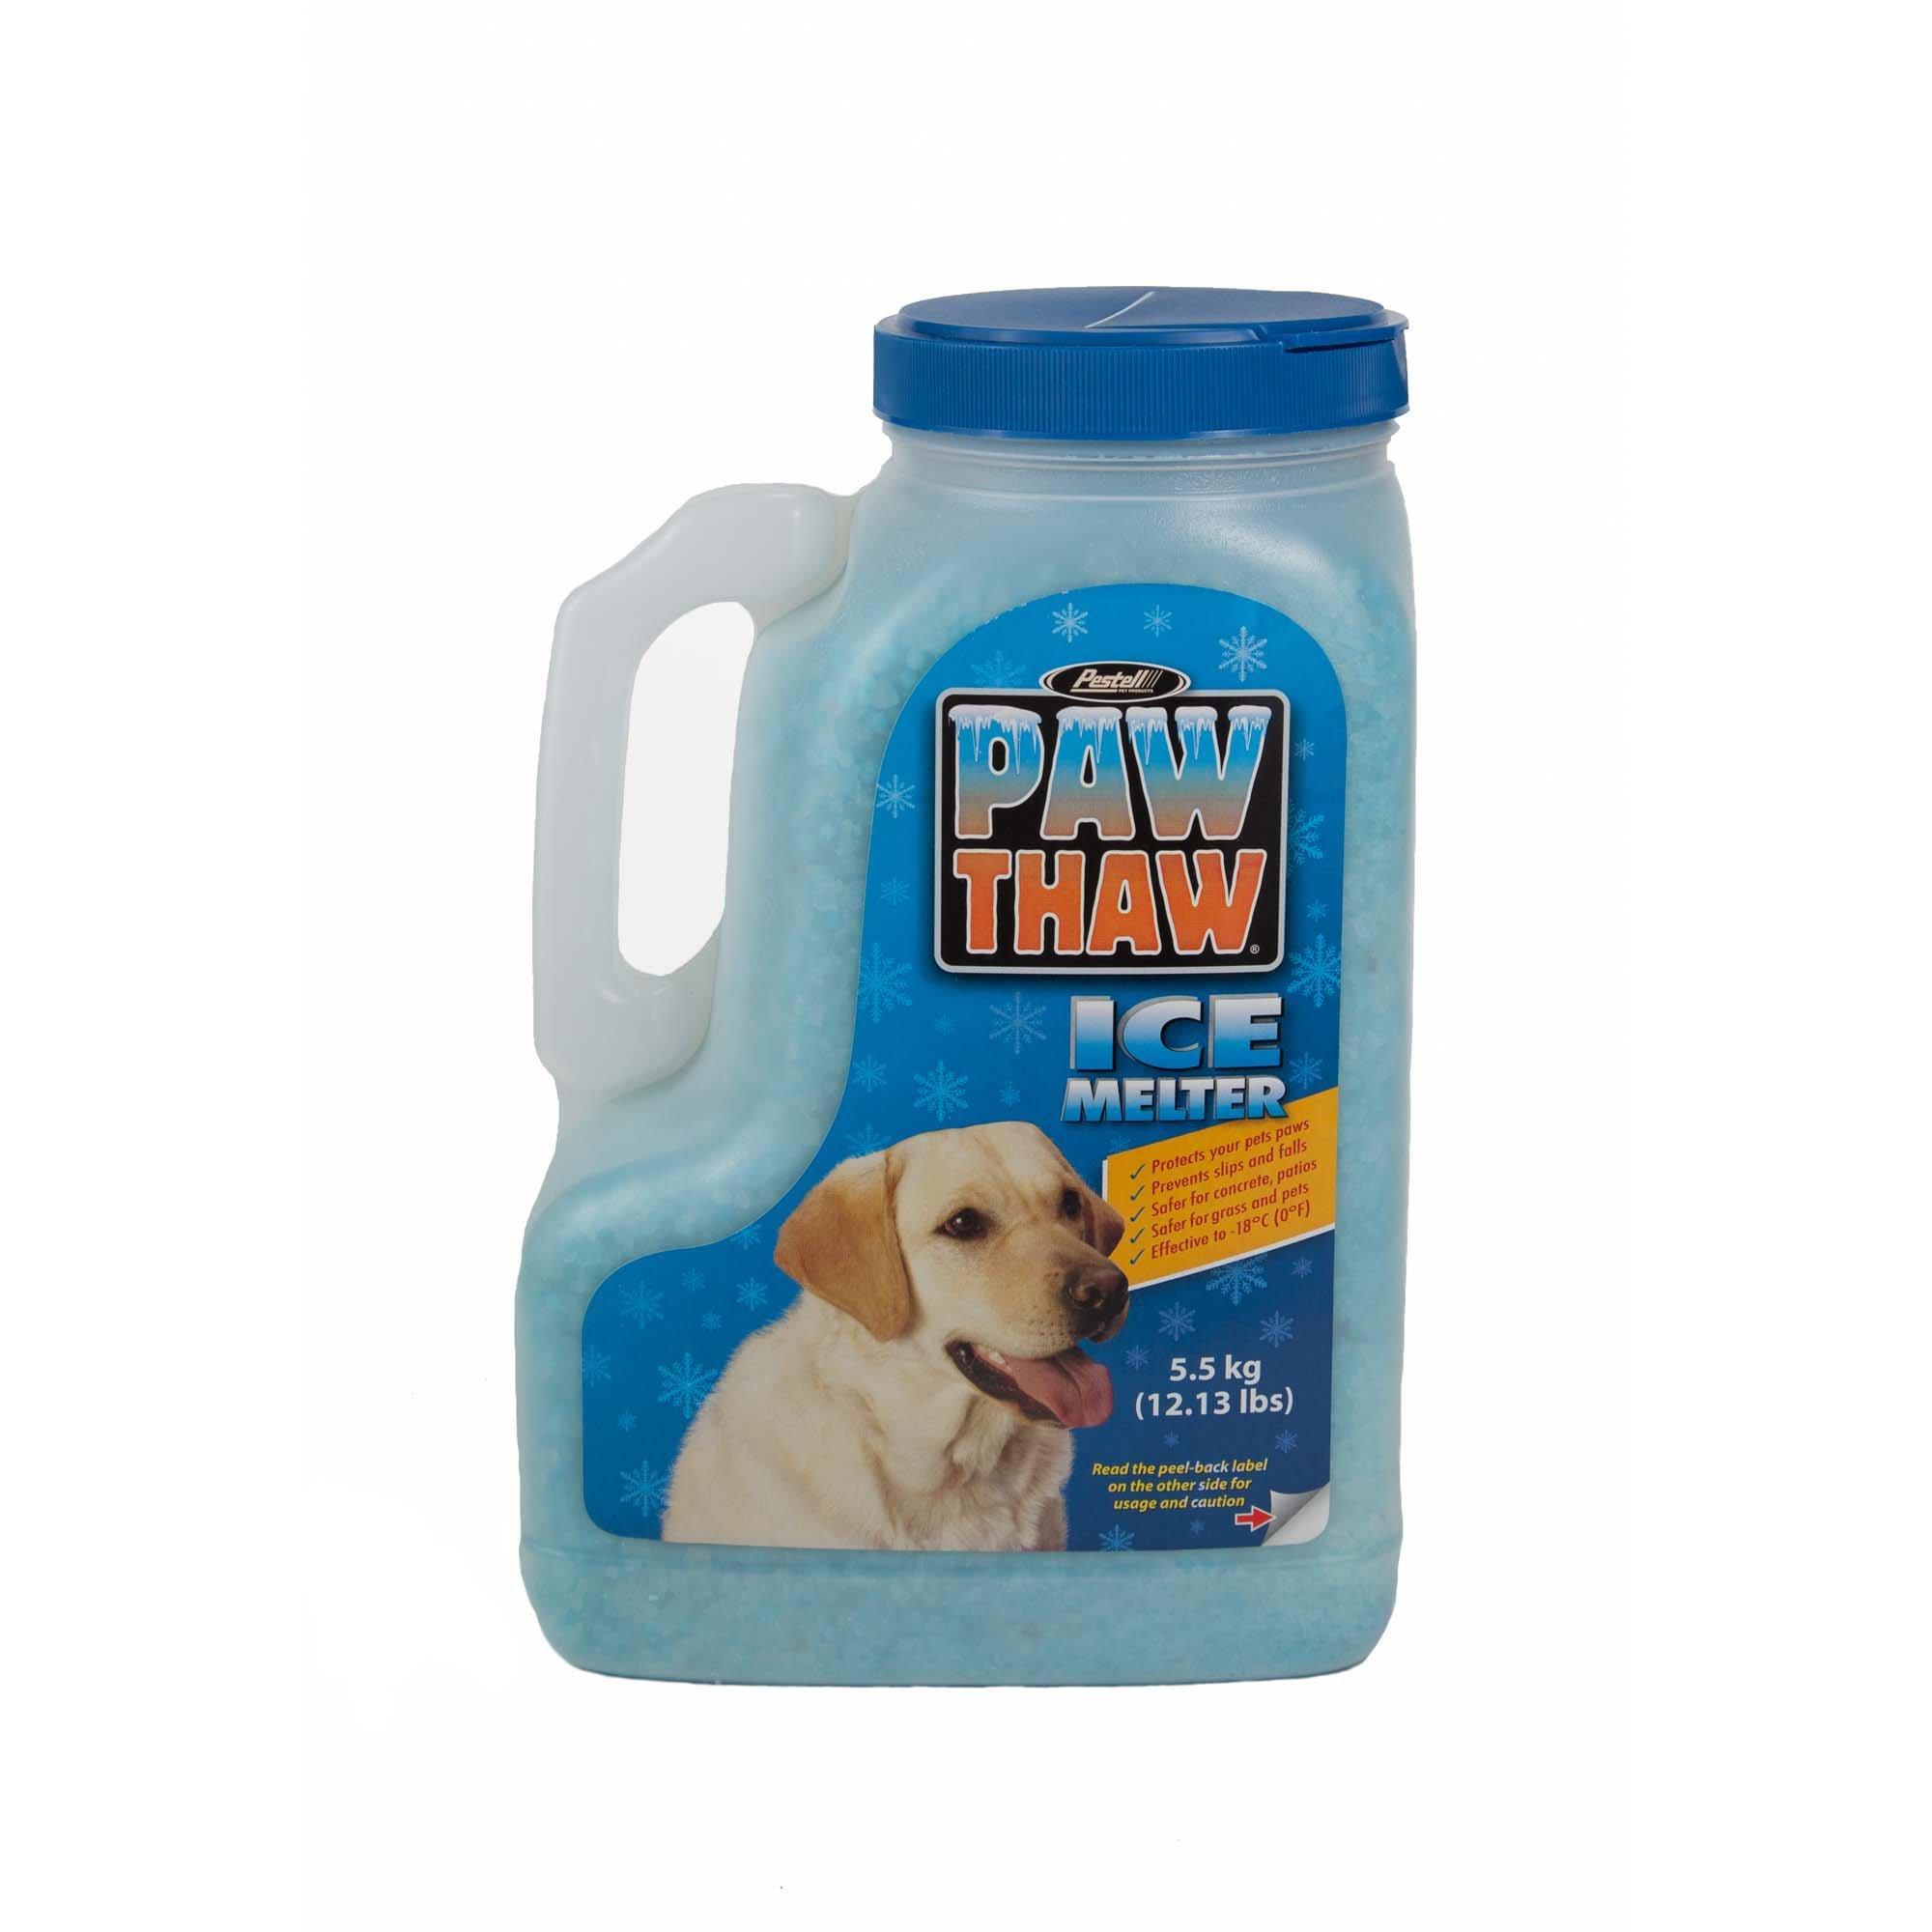 PSTL PAW THAW ICE MELT 12 POUND JUG